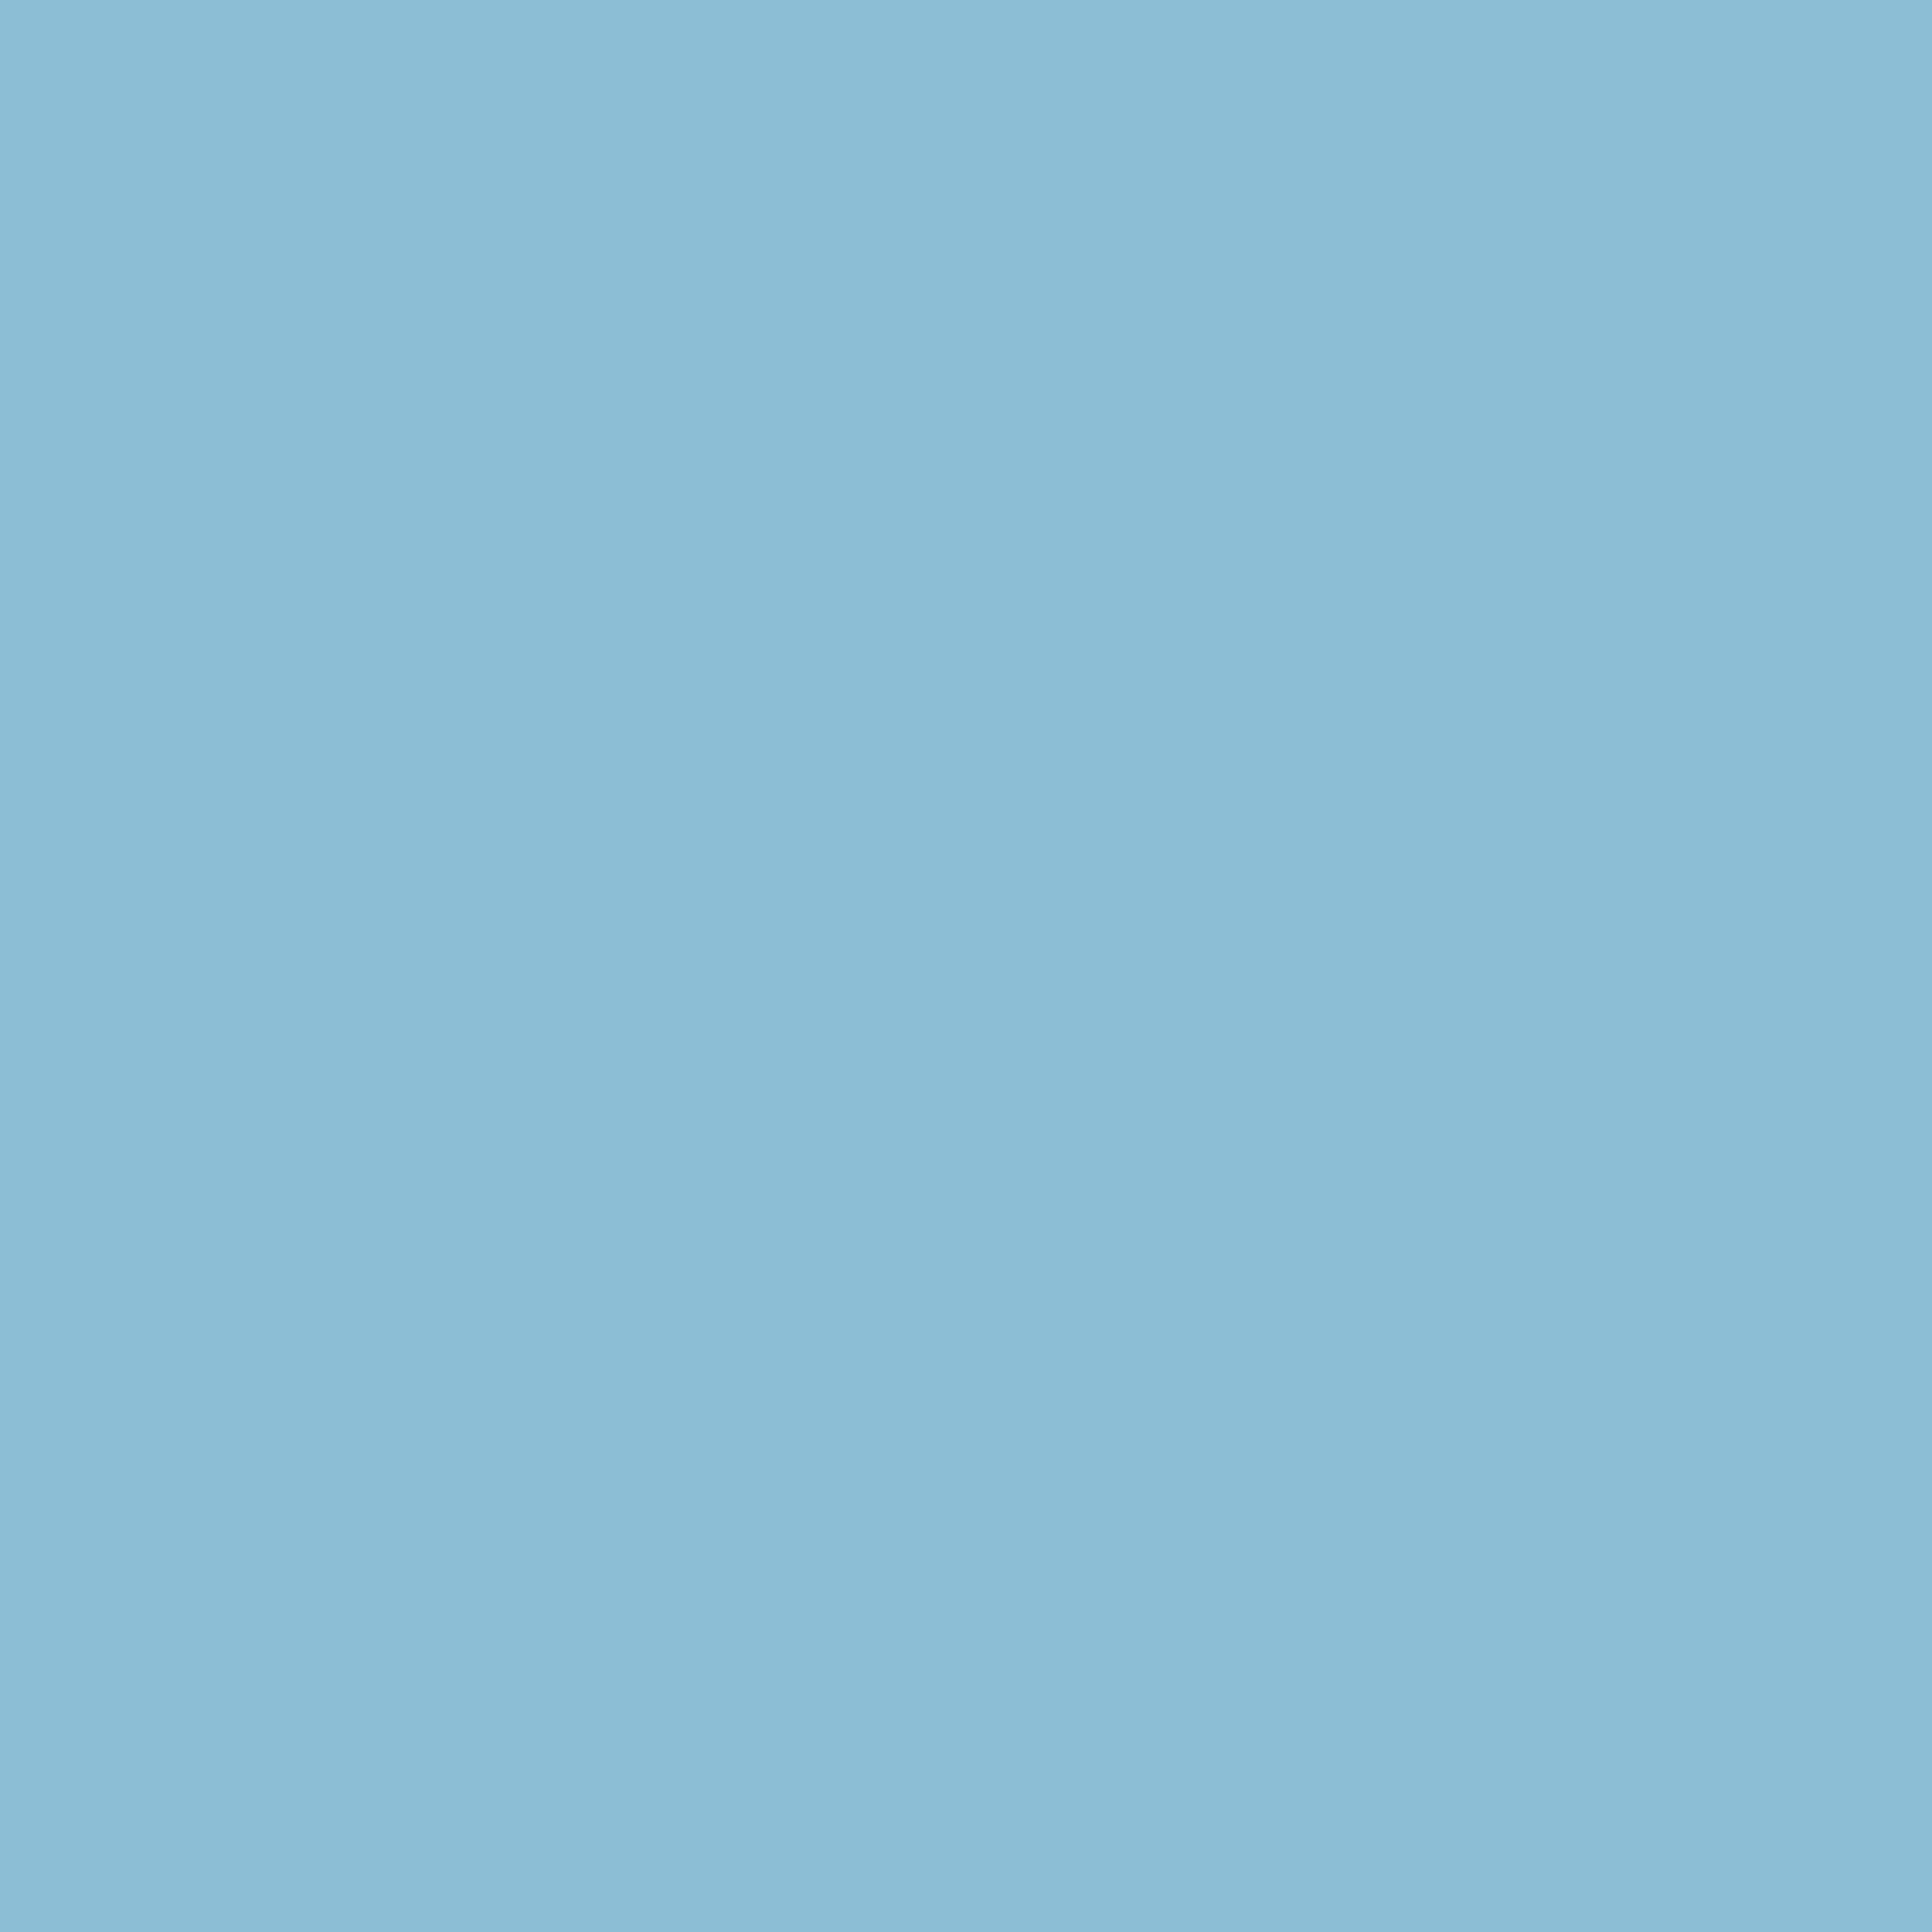 2732x2732 Dark Sky Blue Solid Color Background